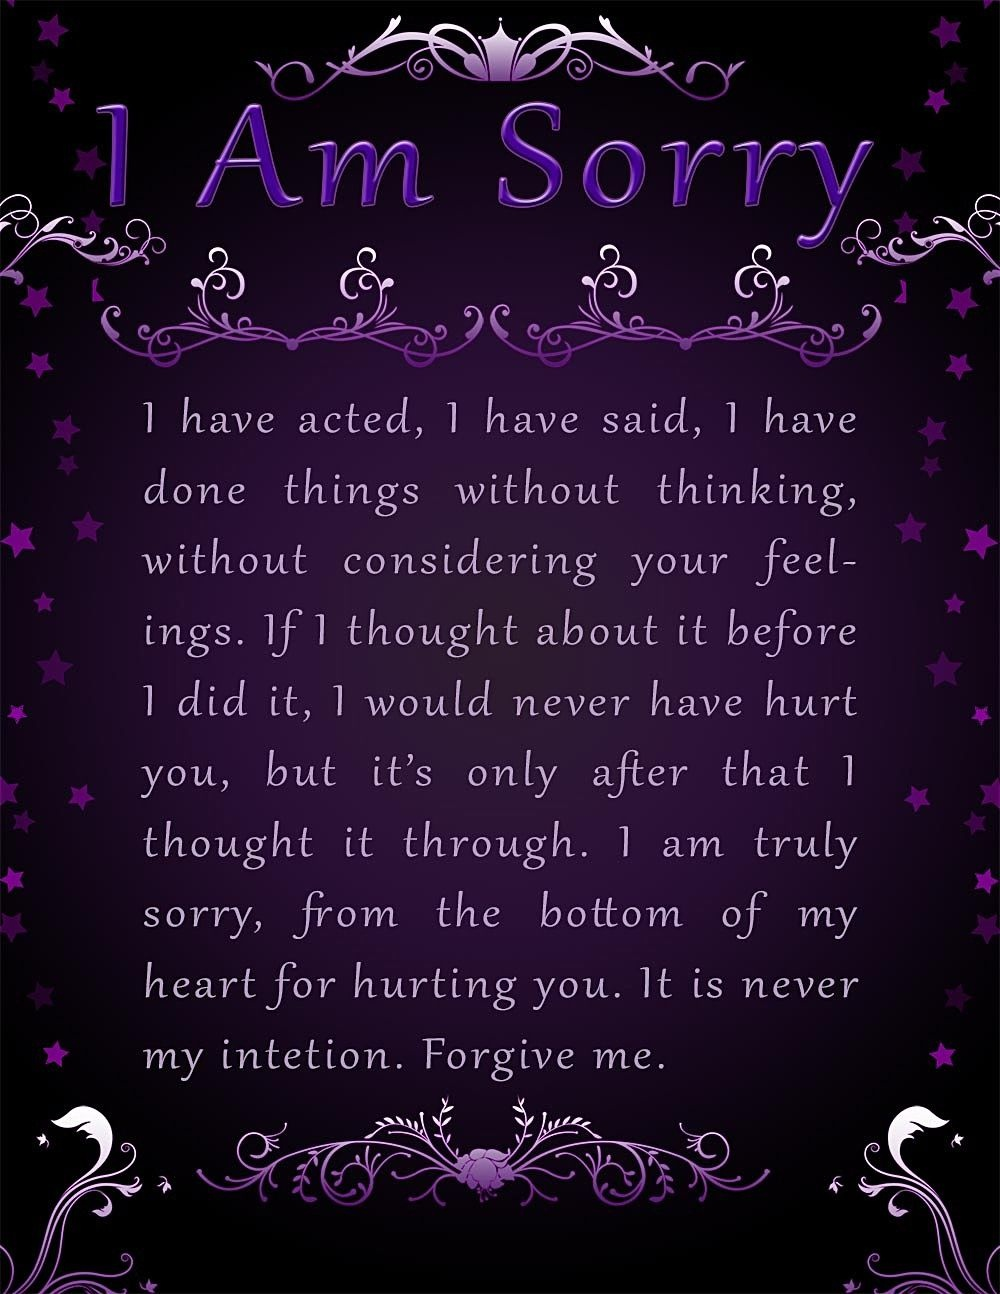 Apology Card Templates   10+ Free Printable Word & Pdf - Free Printable I Am Sorry Cards